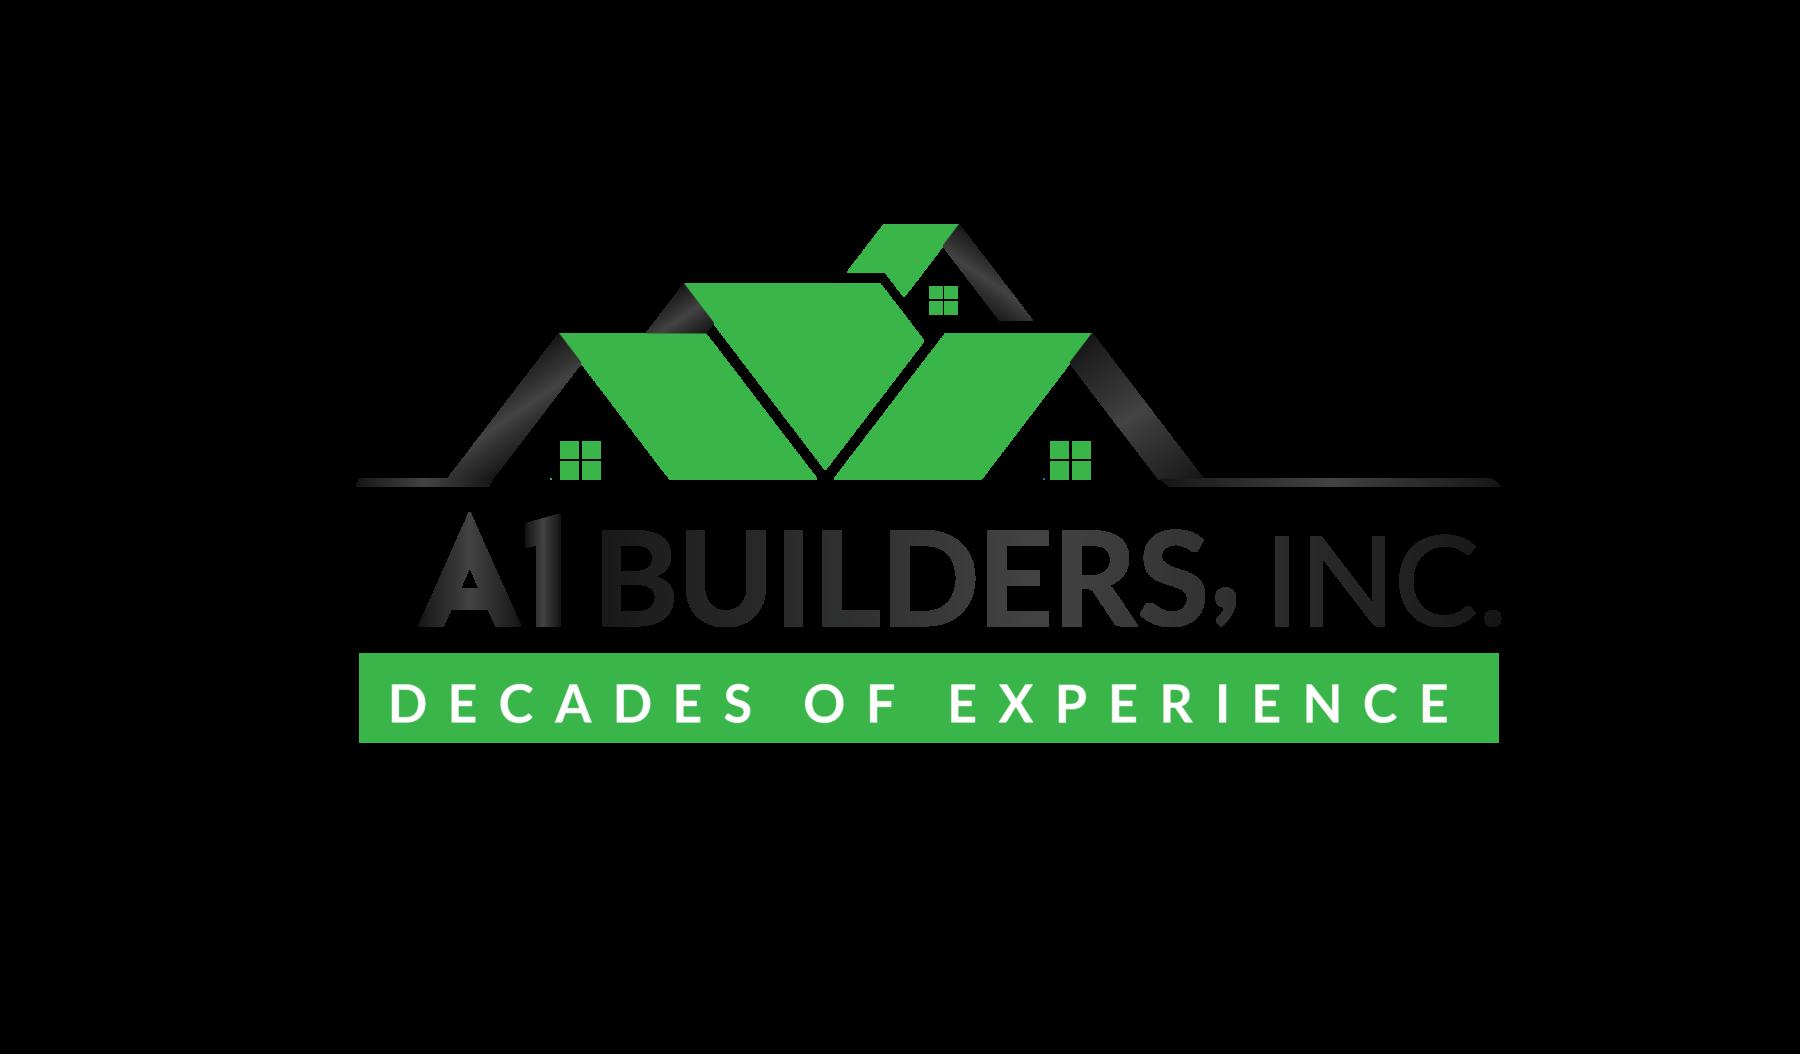 A1 Builders, Inc.